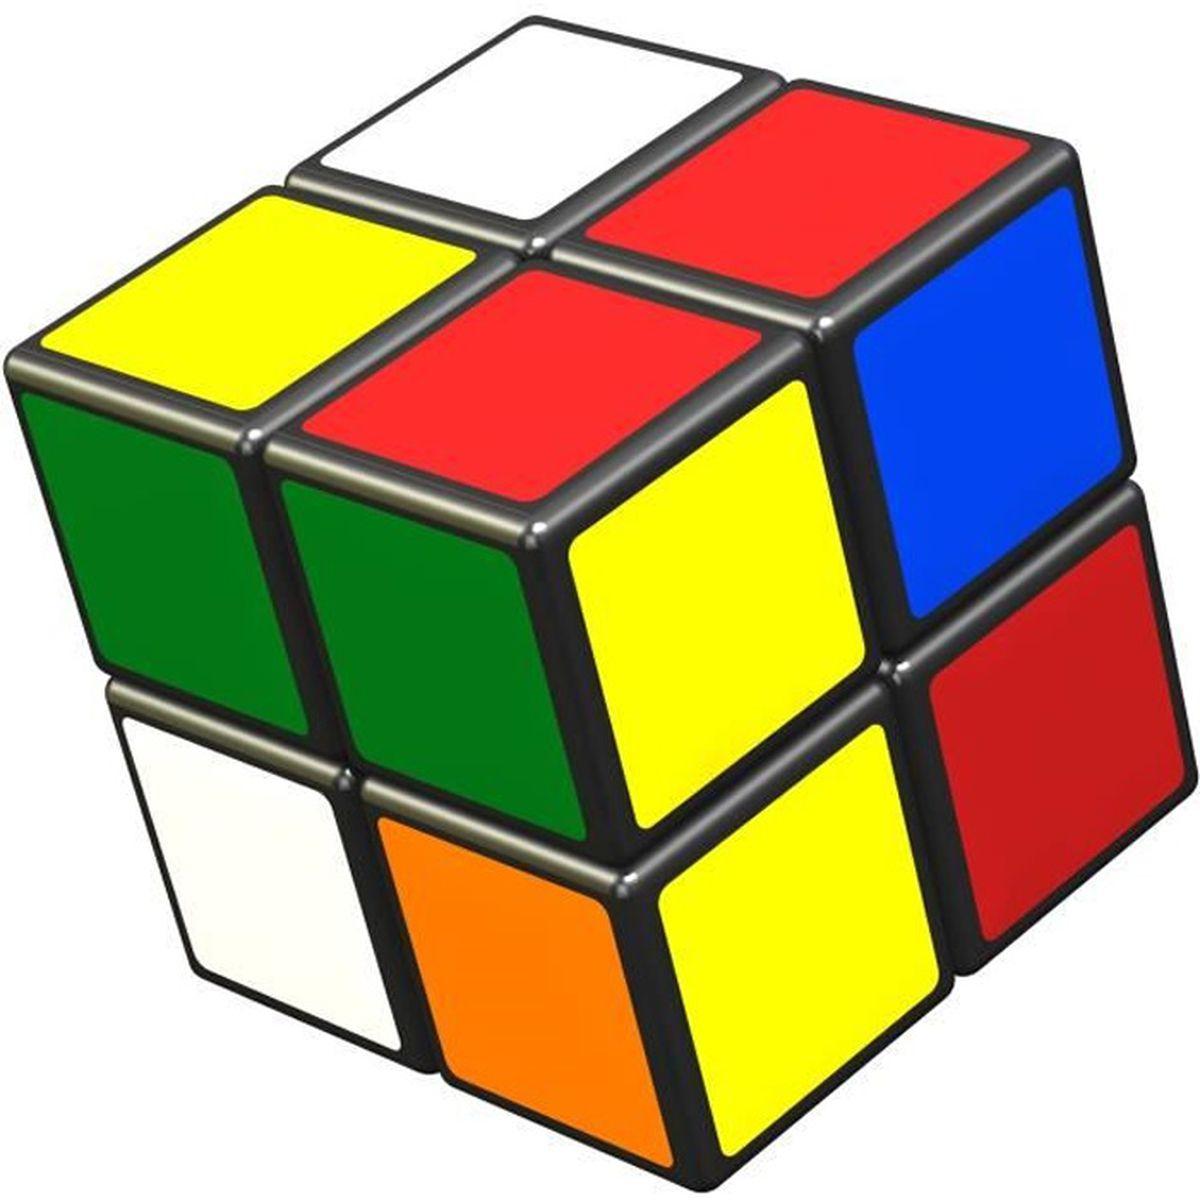 wingames rubik 39 s cube 2x2 advanced rotation achat vente casse t te cdiscount. Black Bedroom Furniture Sets. Home Design Ideas